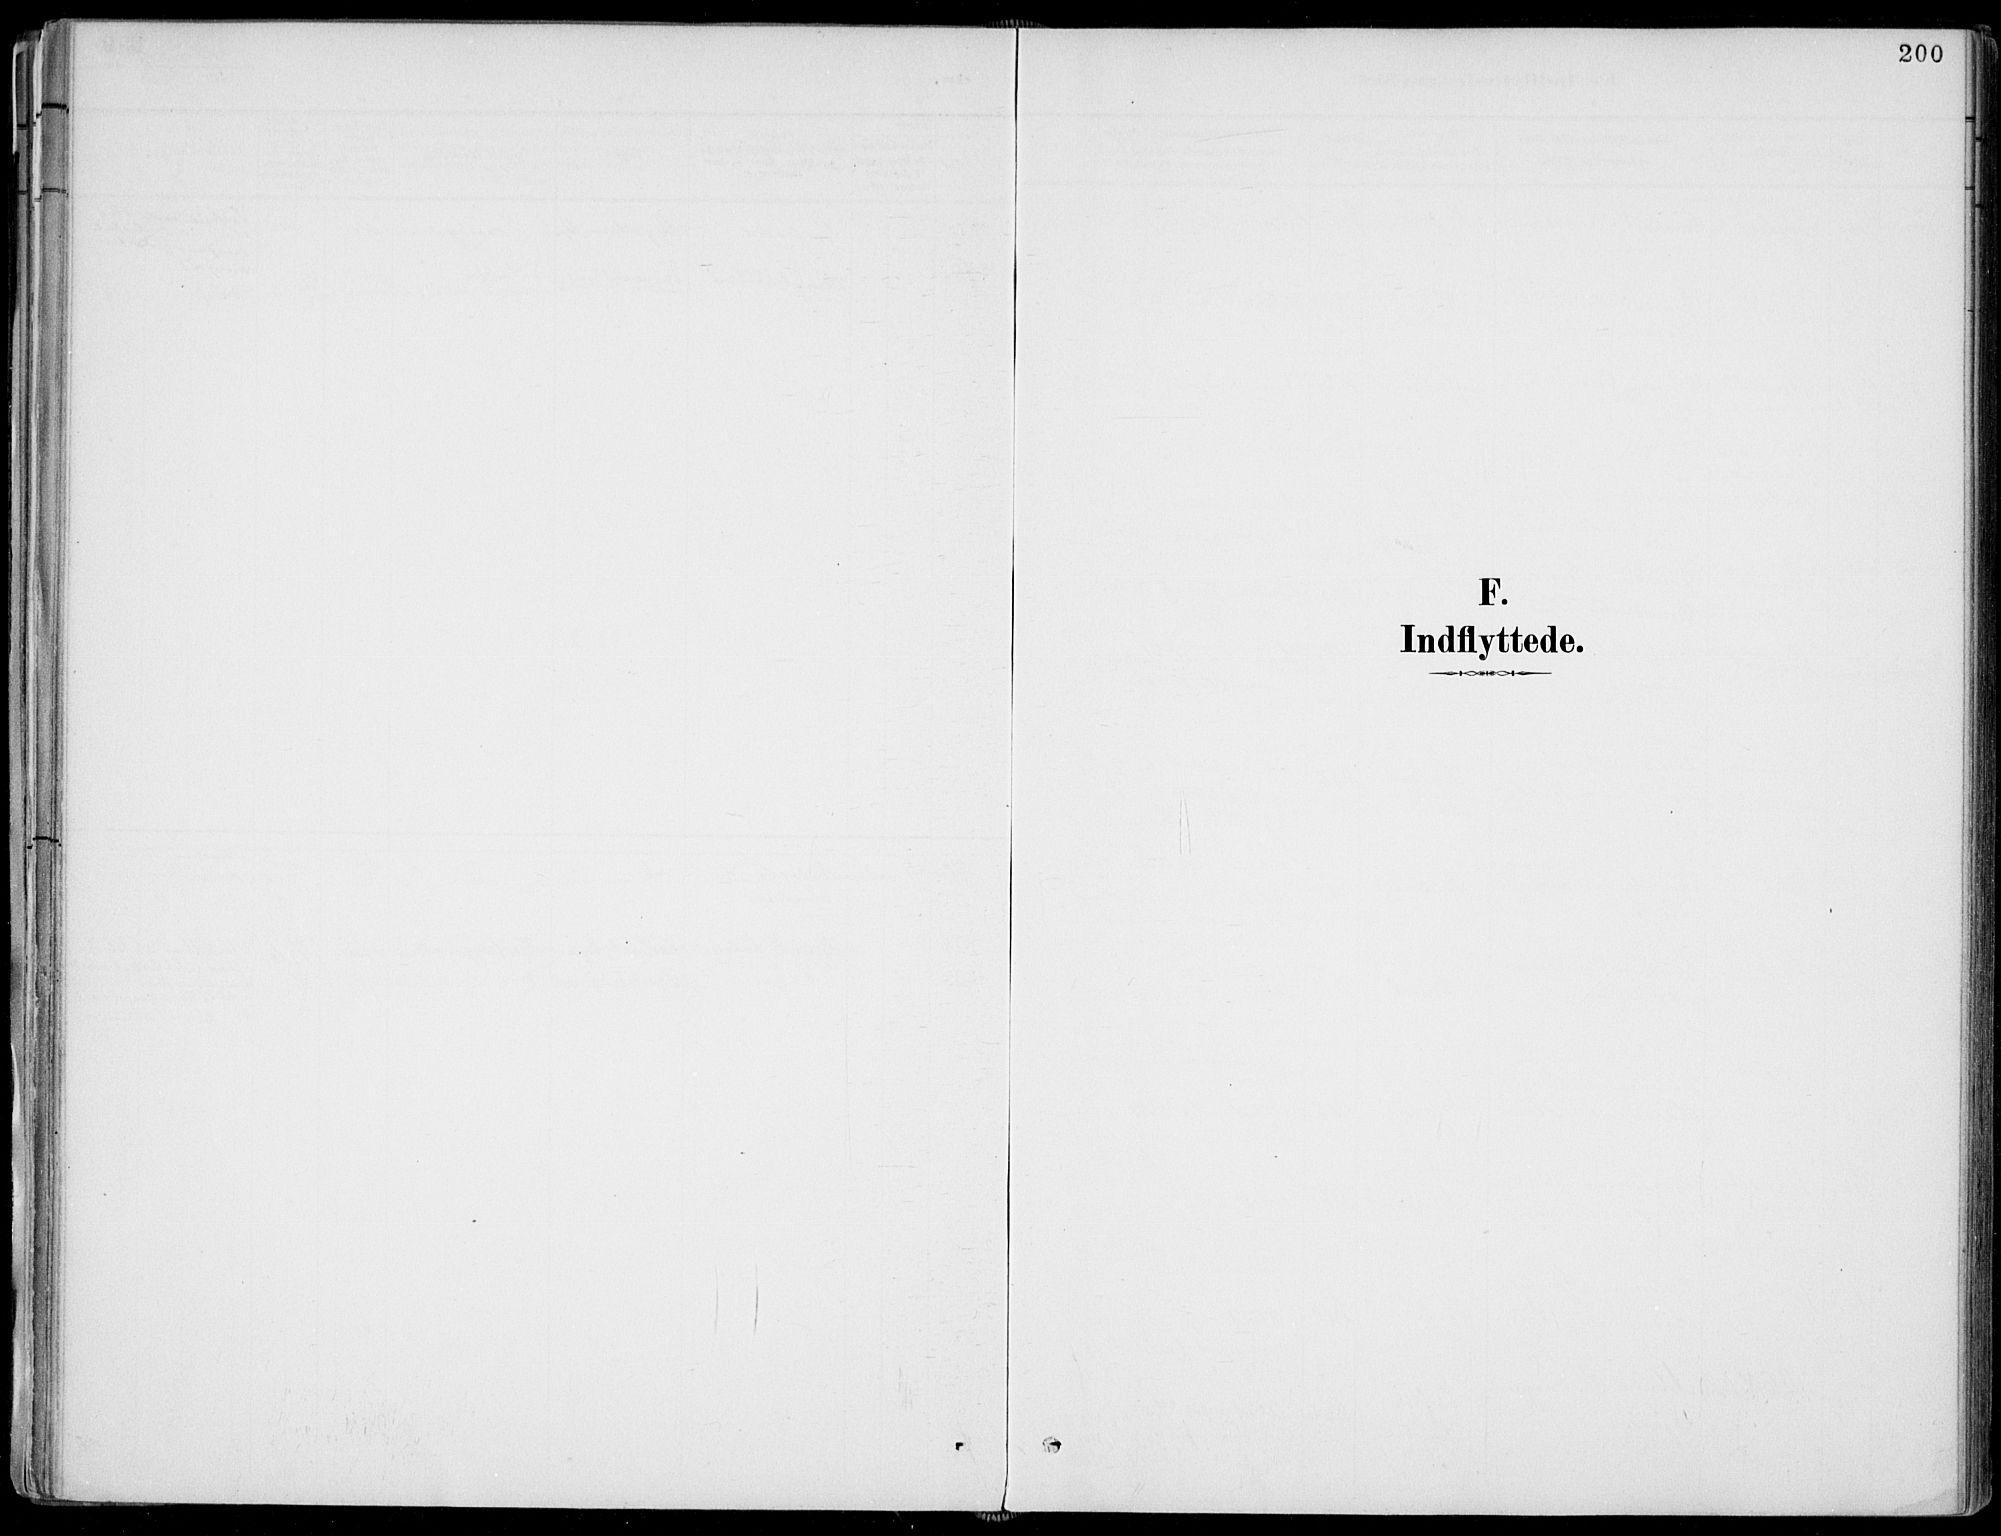 SAKO, Fyresdal kirkebøker, F/Fa/L0007: Parish register (official) no. I 7, 1887-1914, p. 200